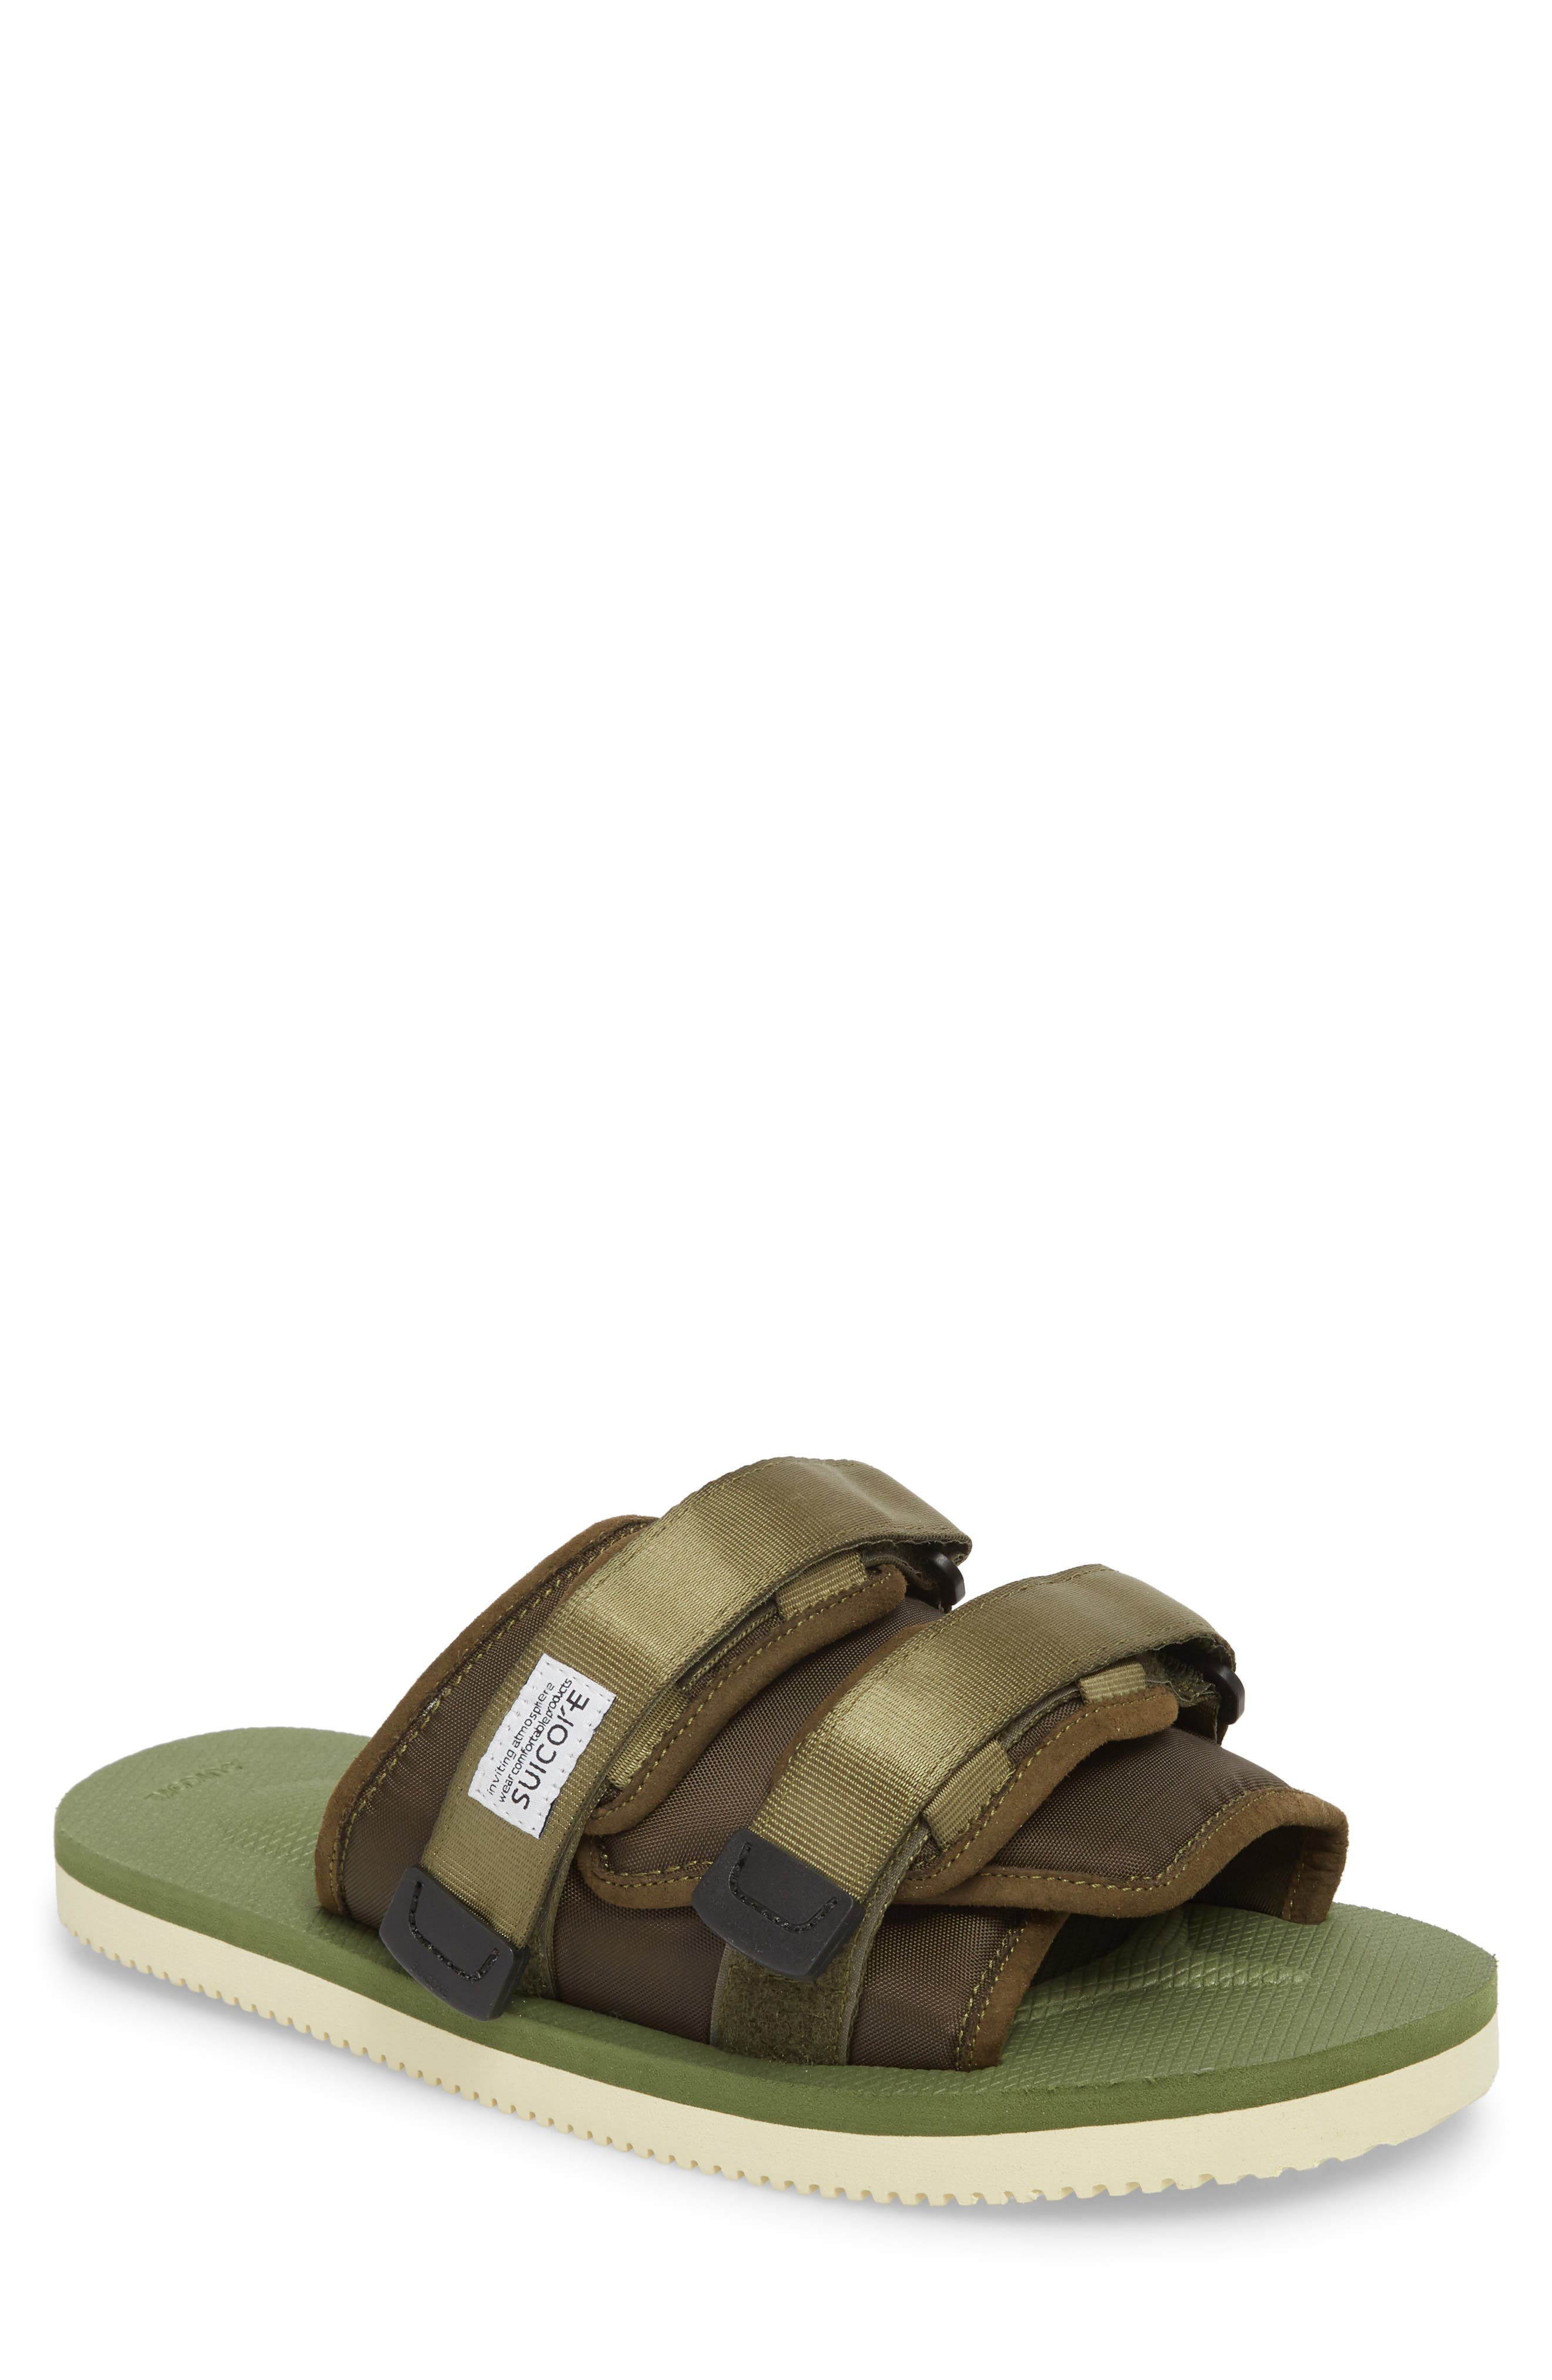 Main Image - Suicoke Moto Cab Slide Sandal (Men)